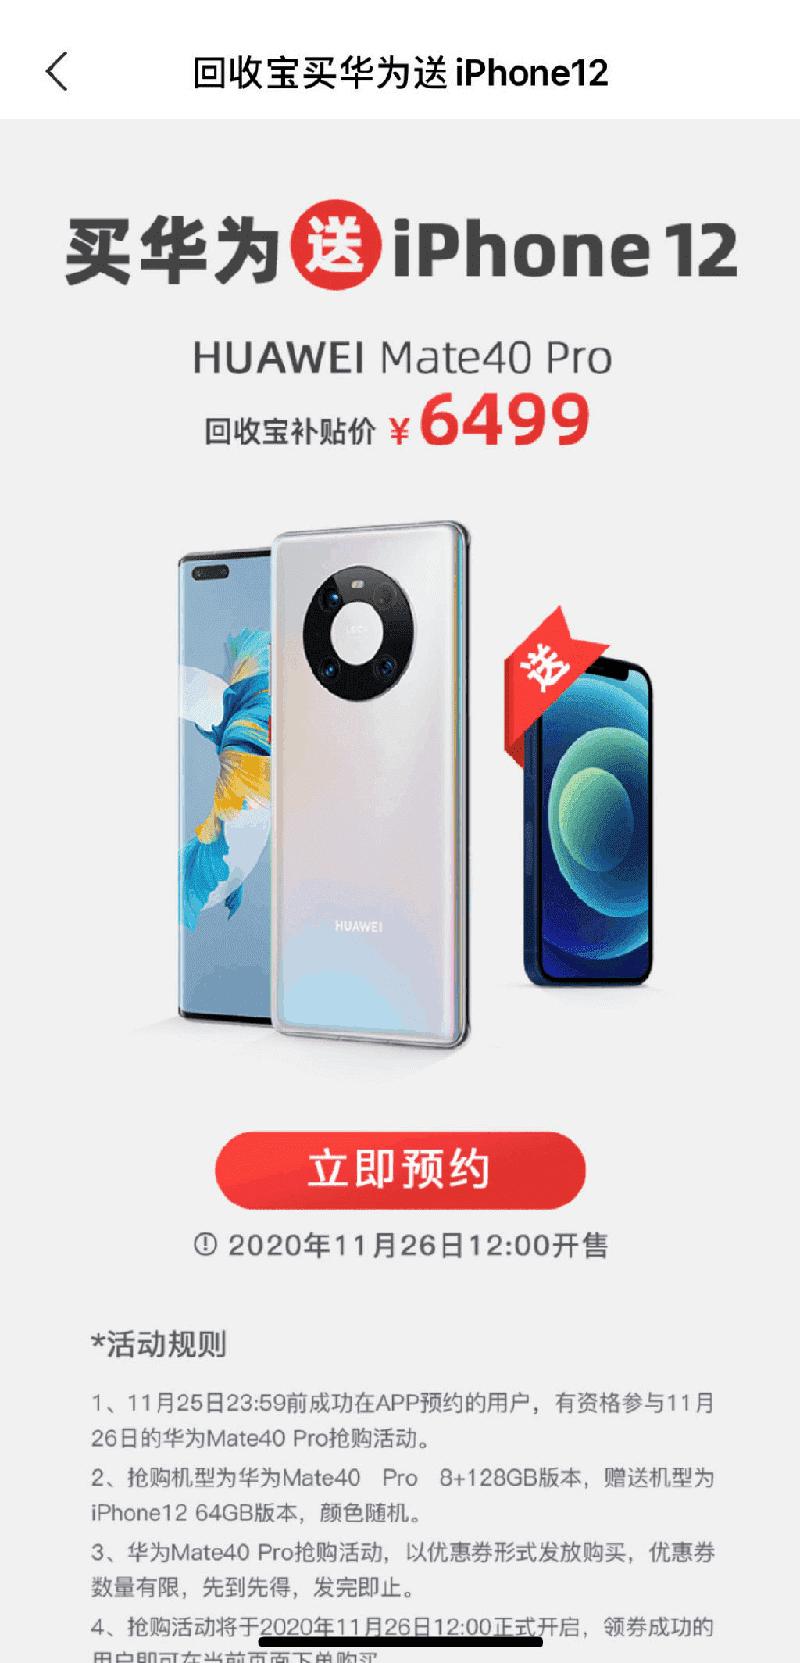 Poster from Chinese online store Huihuibao